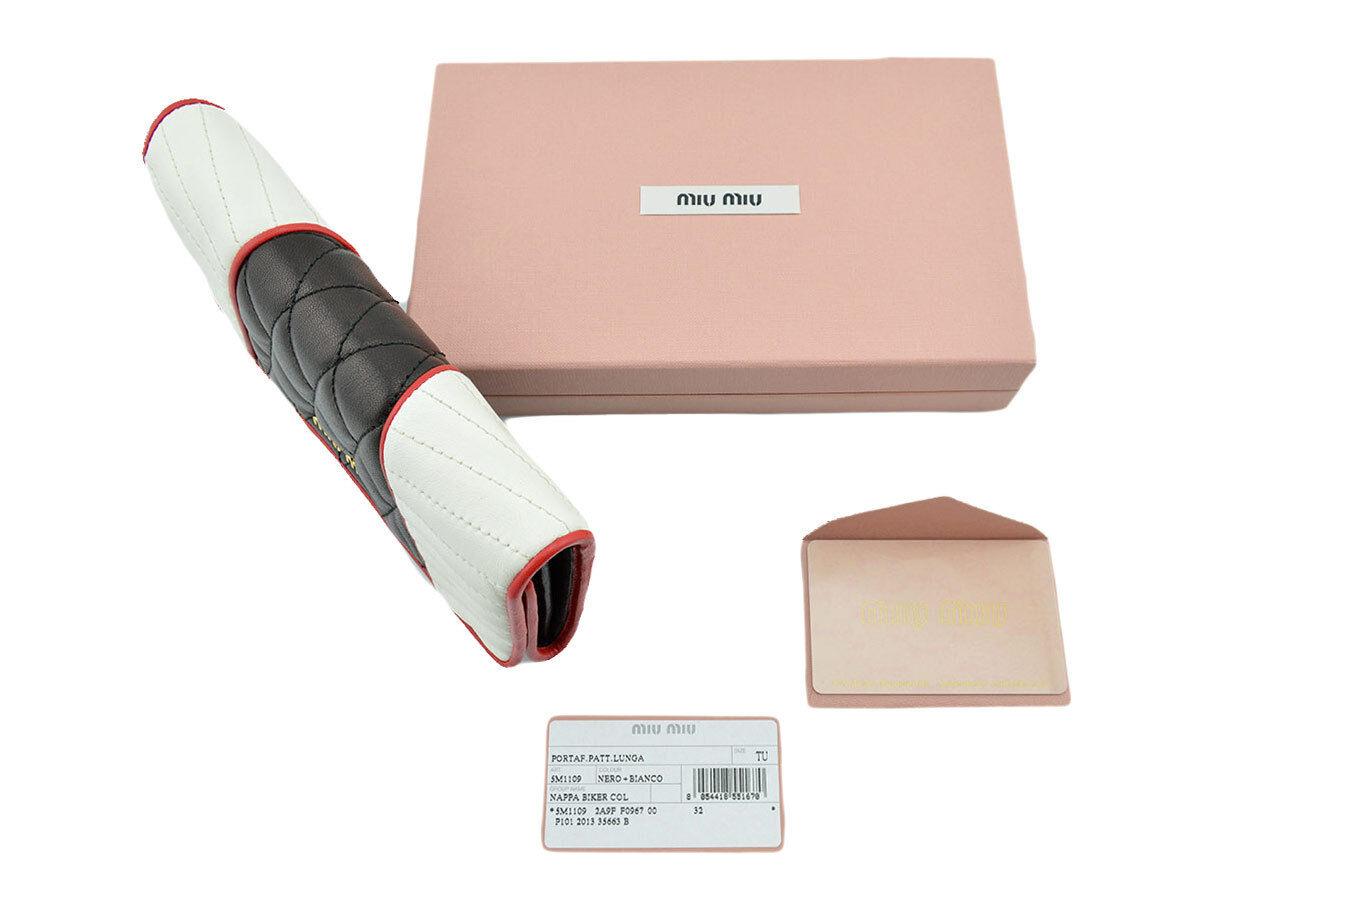 318bd48a24f1c $650 MIU MIU Black White Red NAPPA BIKER Leather Clutch Wallet LIMITED  EDITION. `